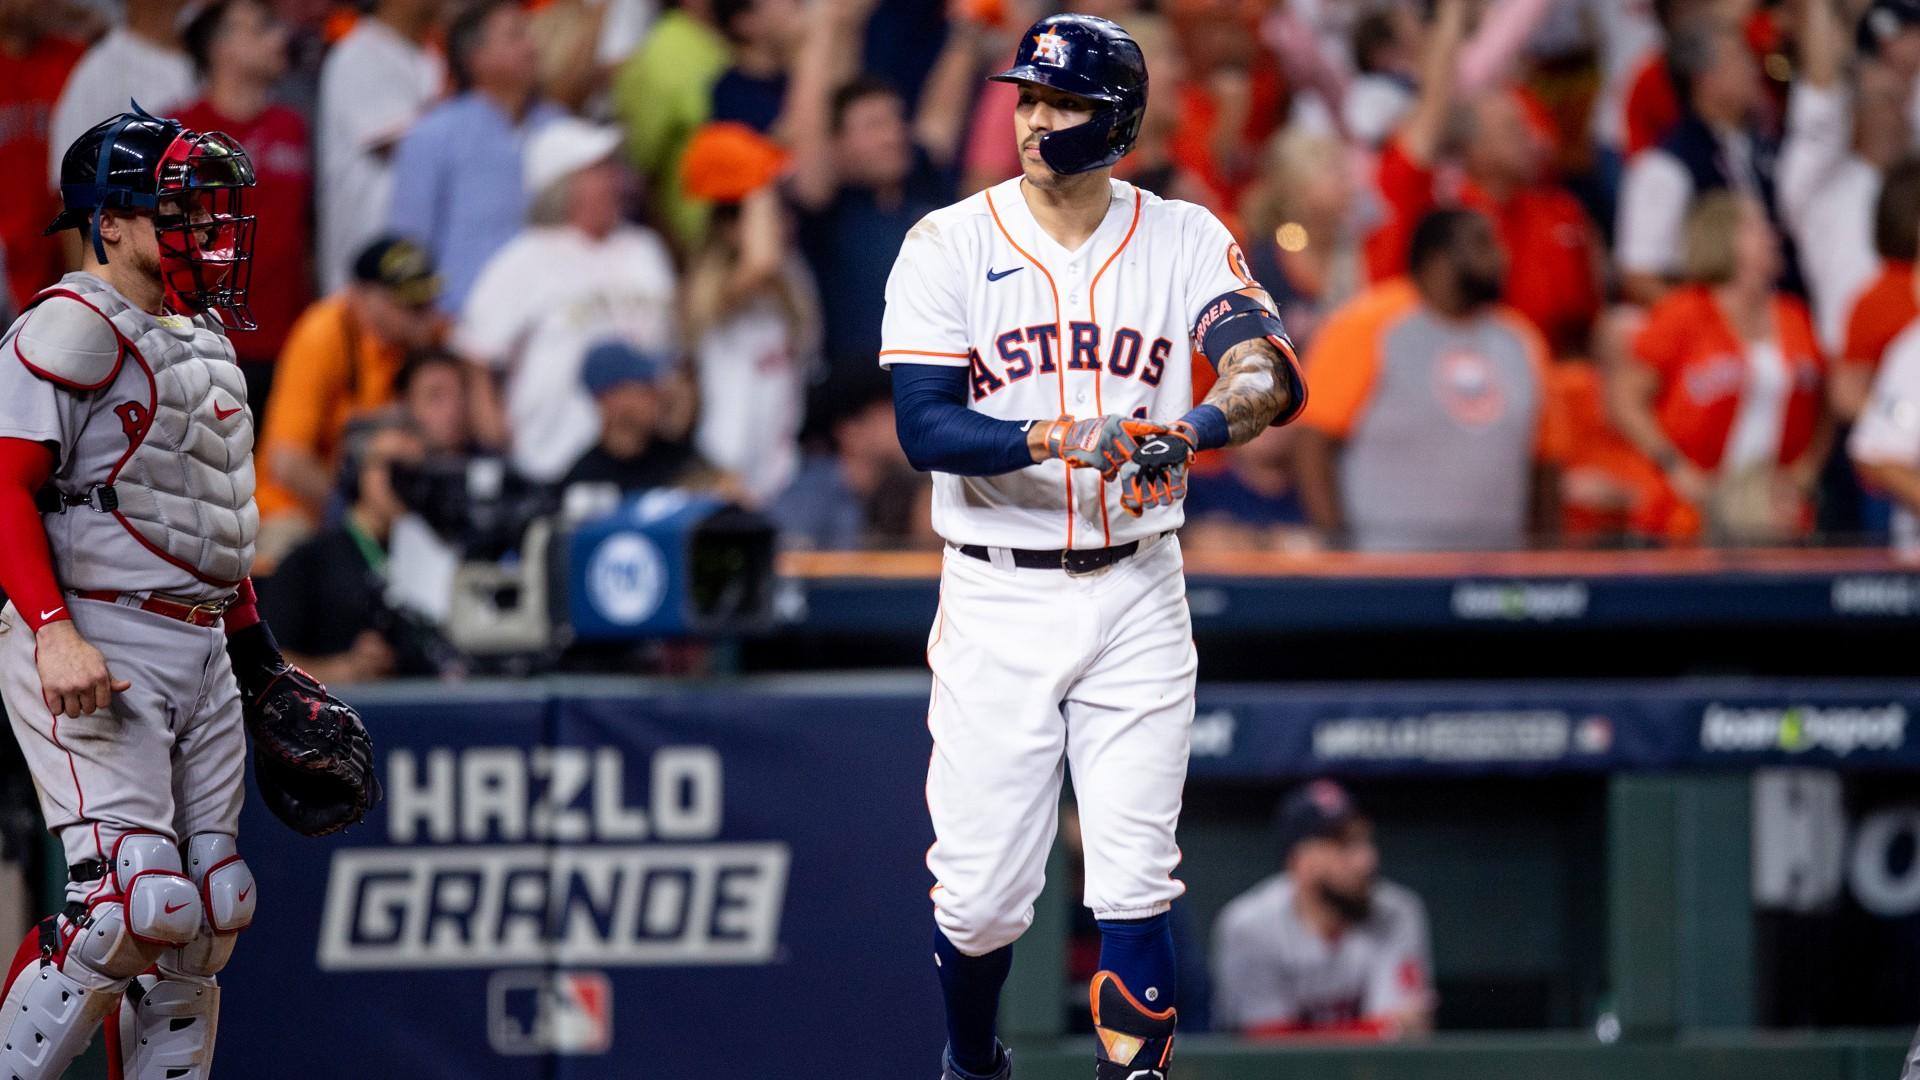 Astros-Red Sox ALCS Game 1 takeaways: Kike' Hernandez keeps rolling, Houston's middle infield stays clutch